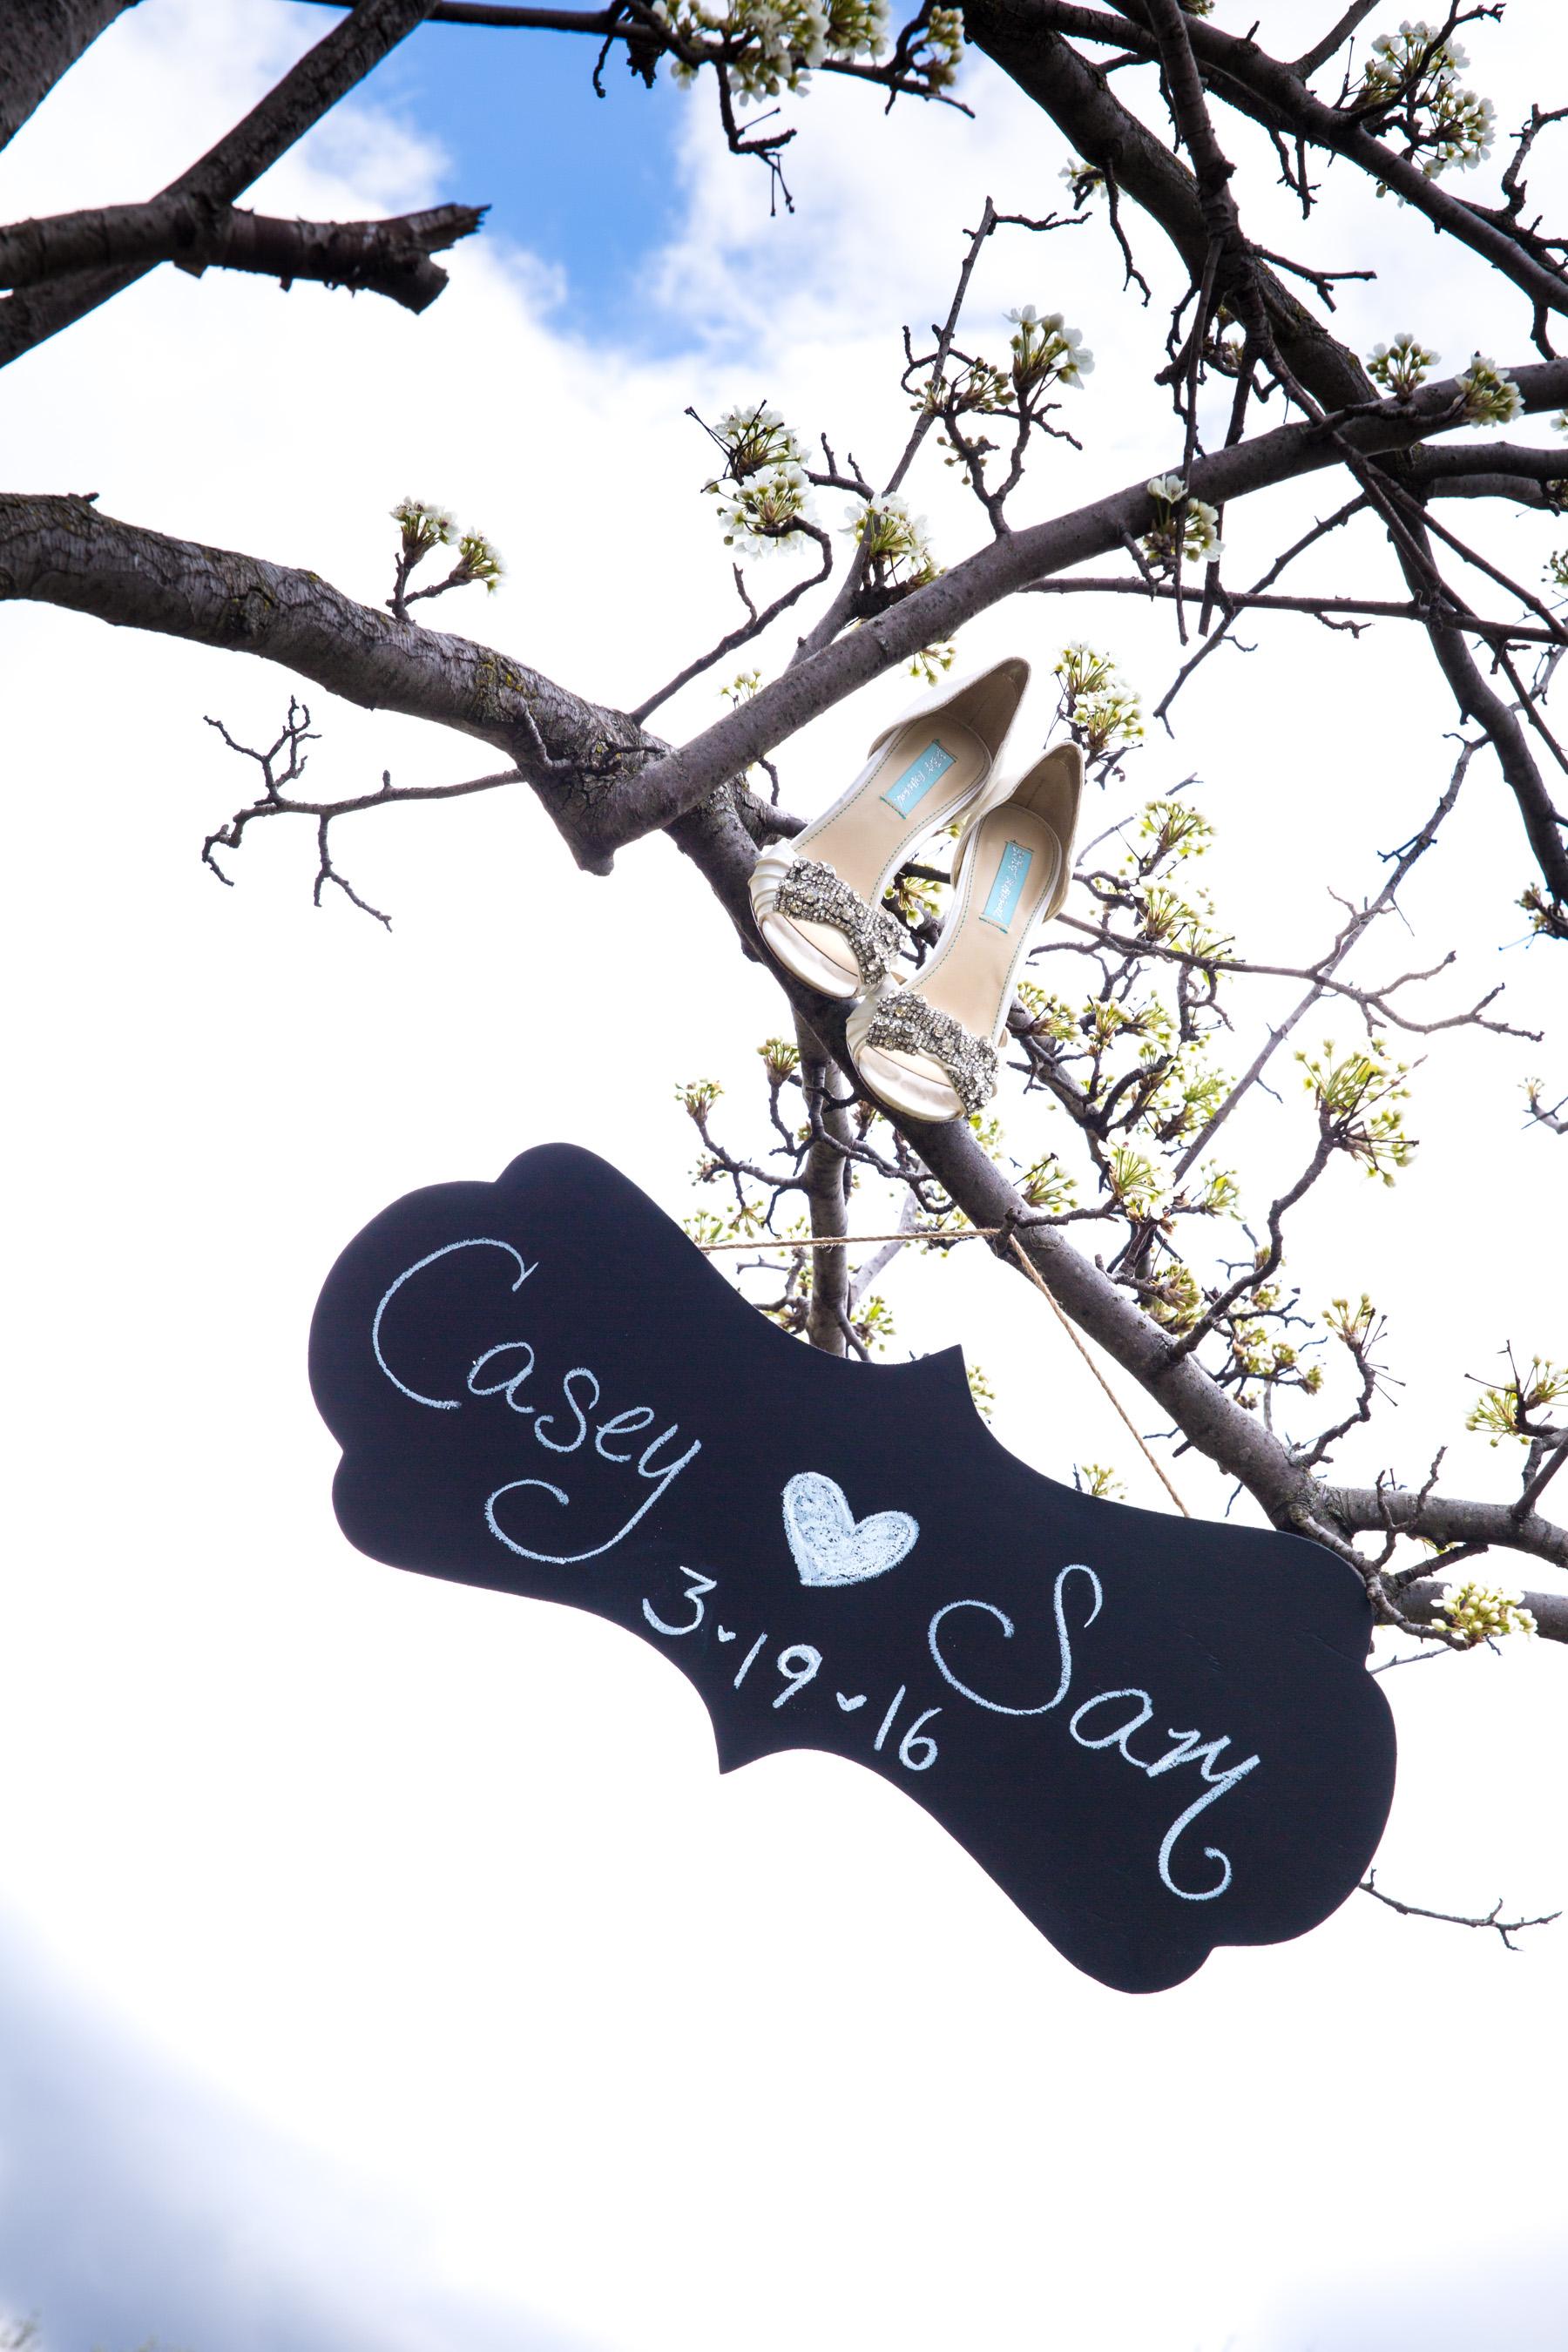 Casey & Sam 3.19.2016 CatsEye (129 of 290).jpg